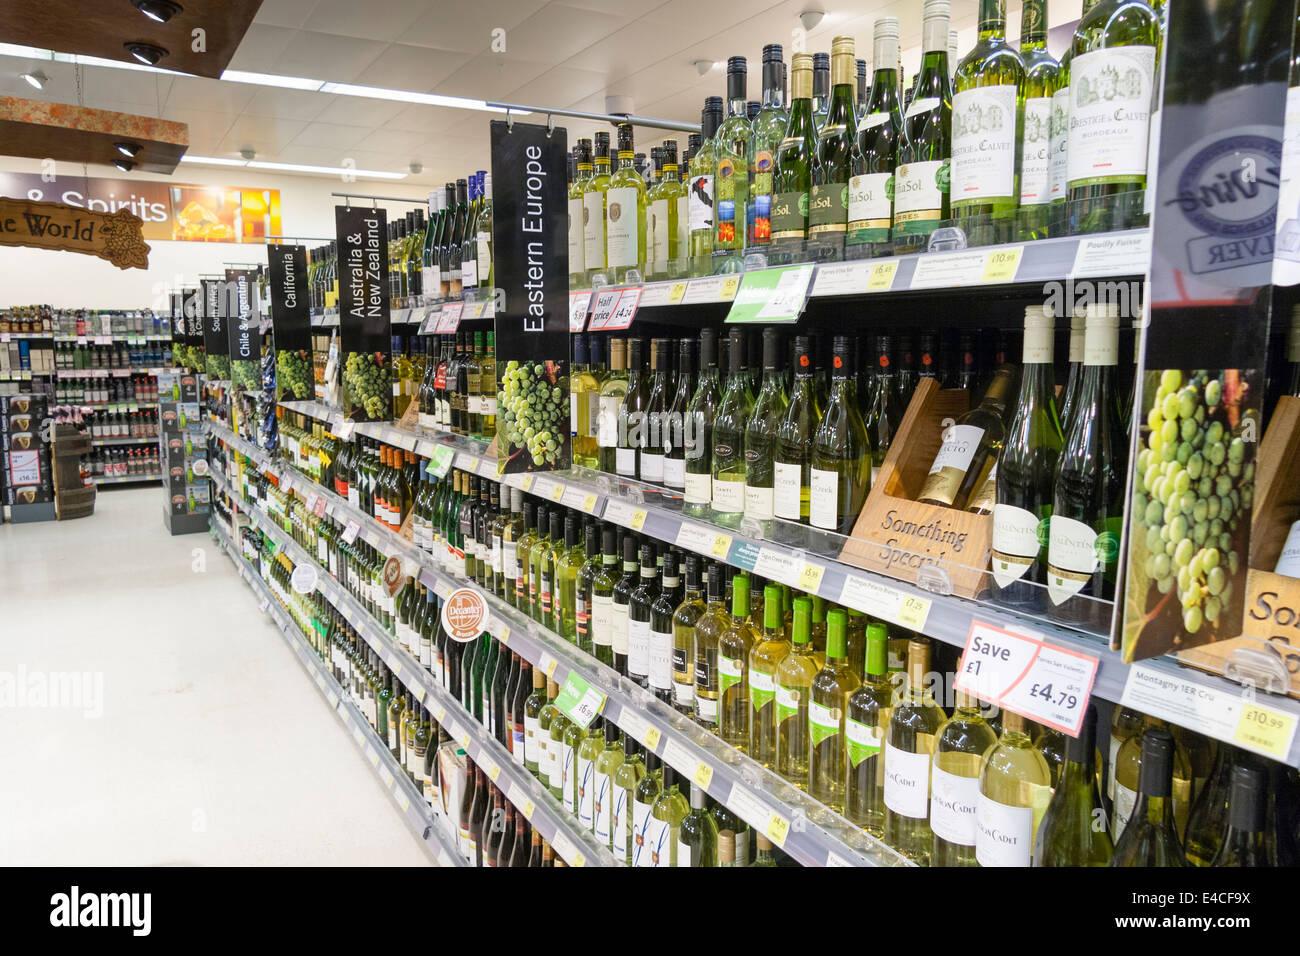 Bottles of white wine on shelves in a British supermarket - Stock Image